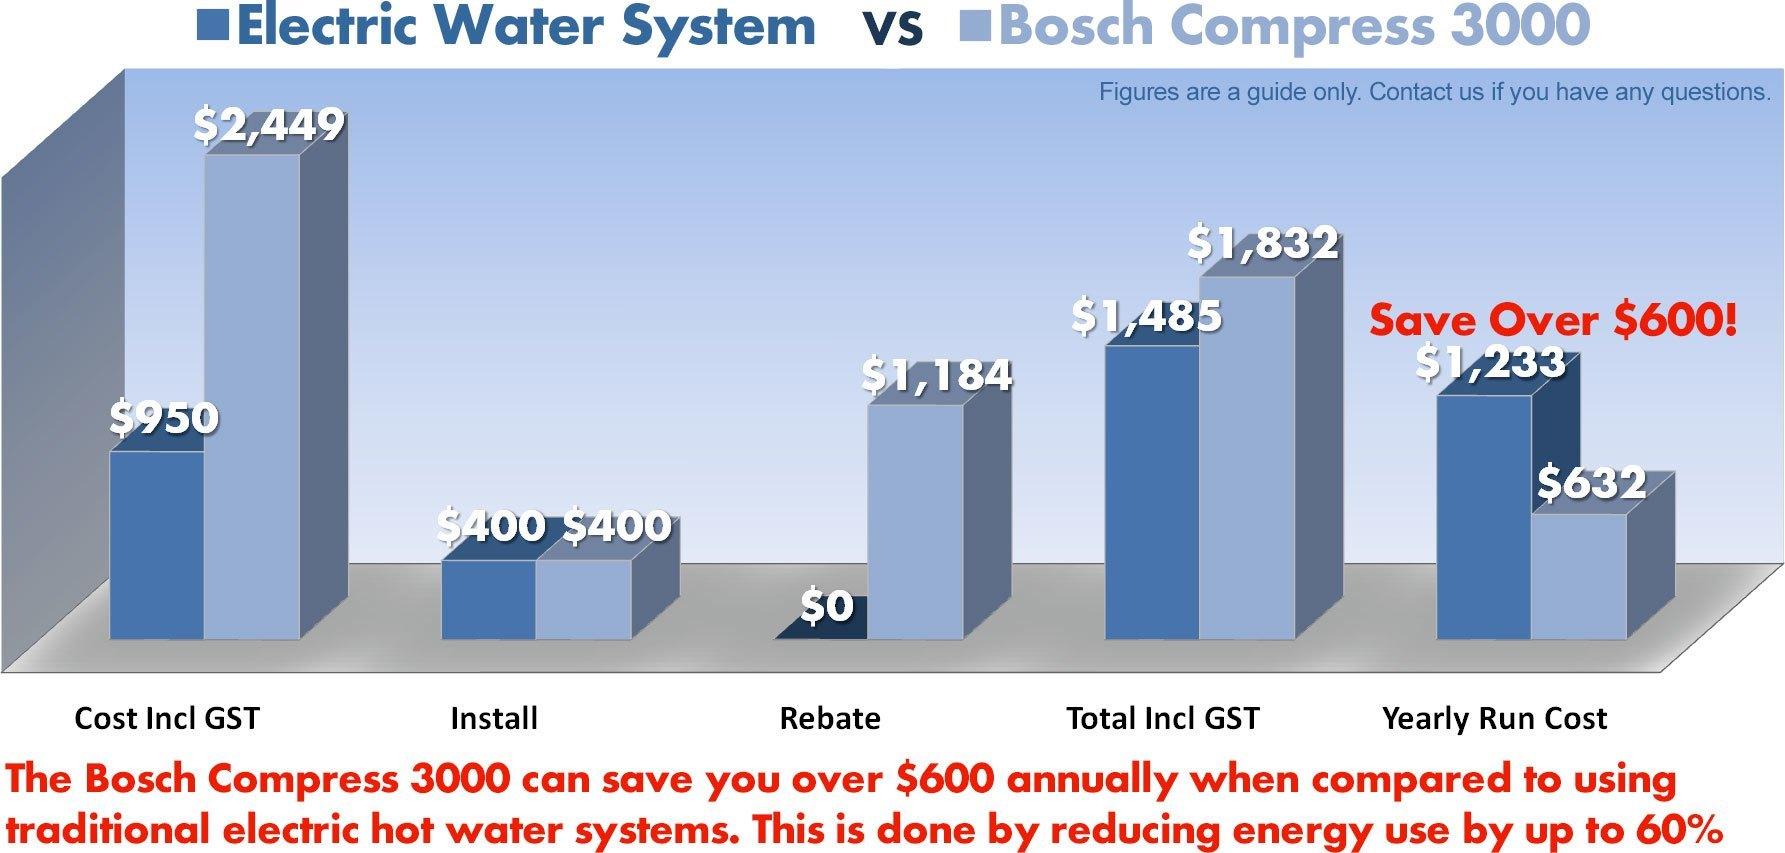 Bosch Compress 3000 Statistics